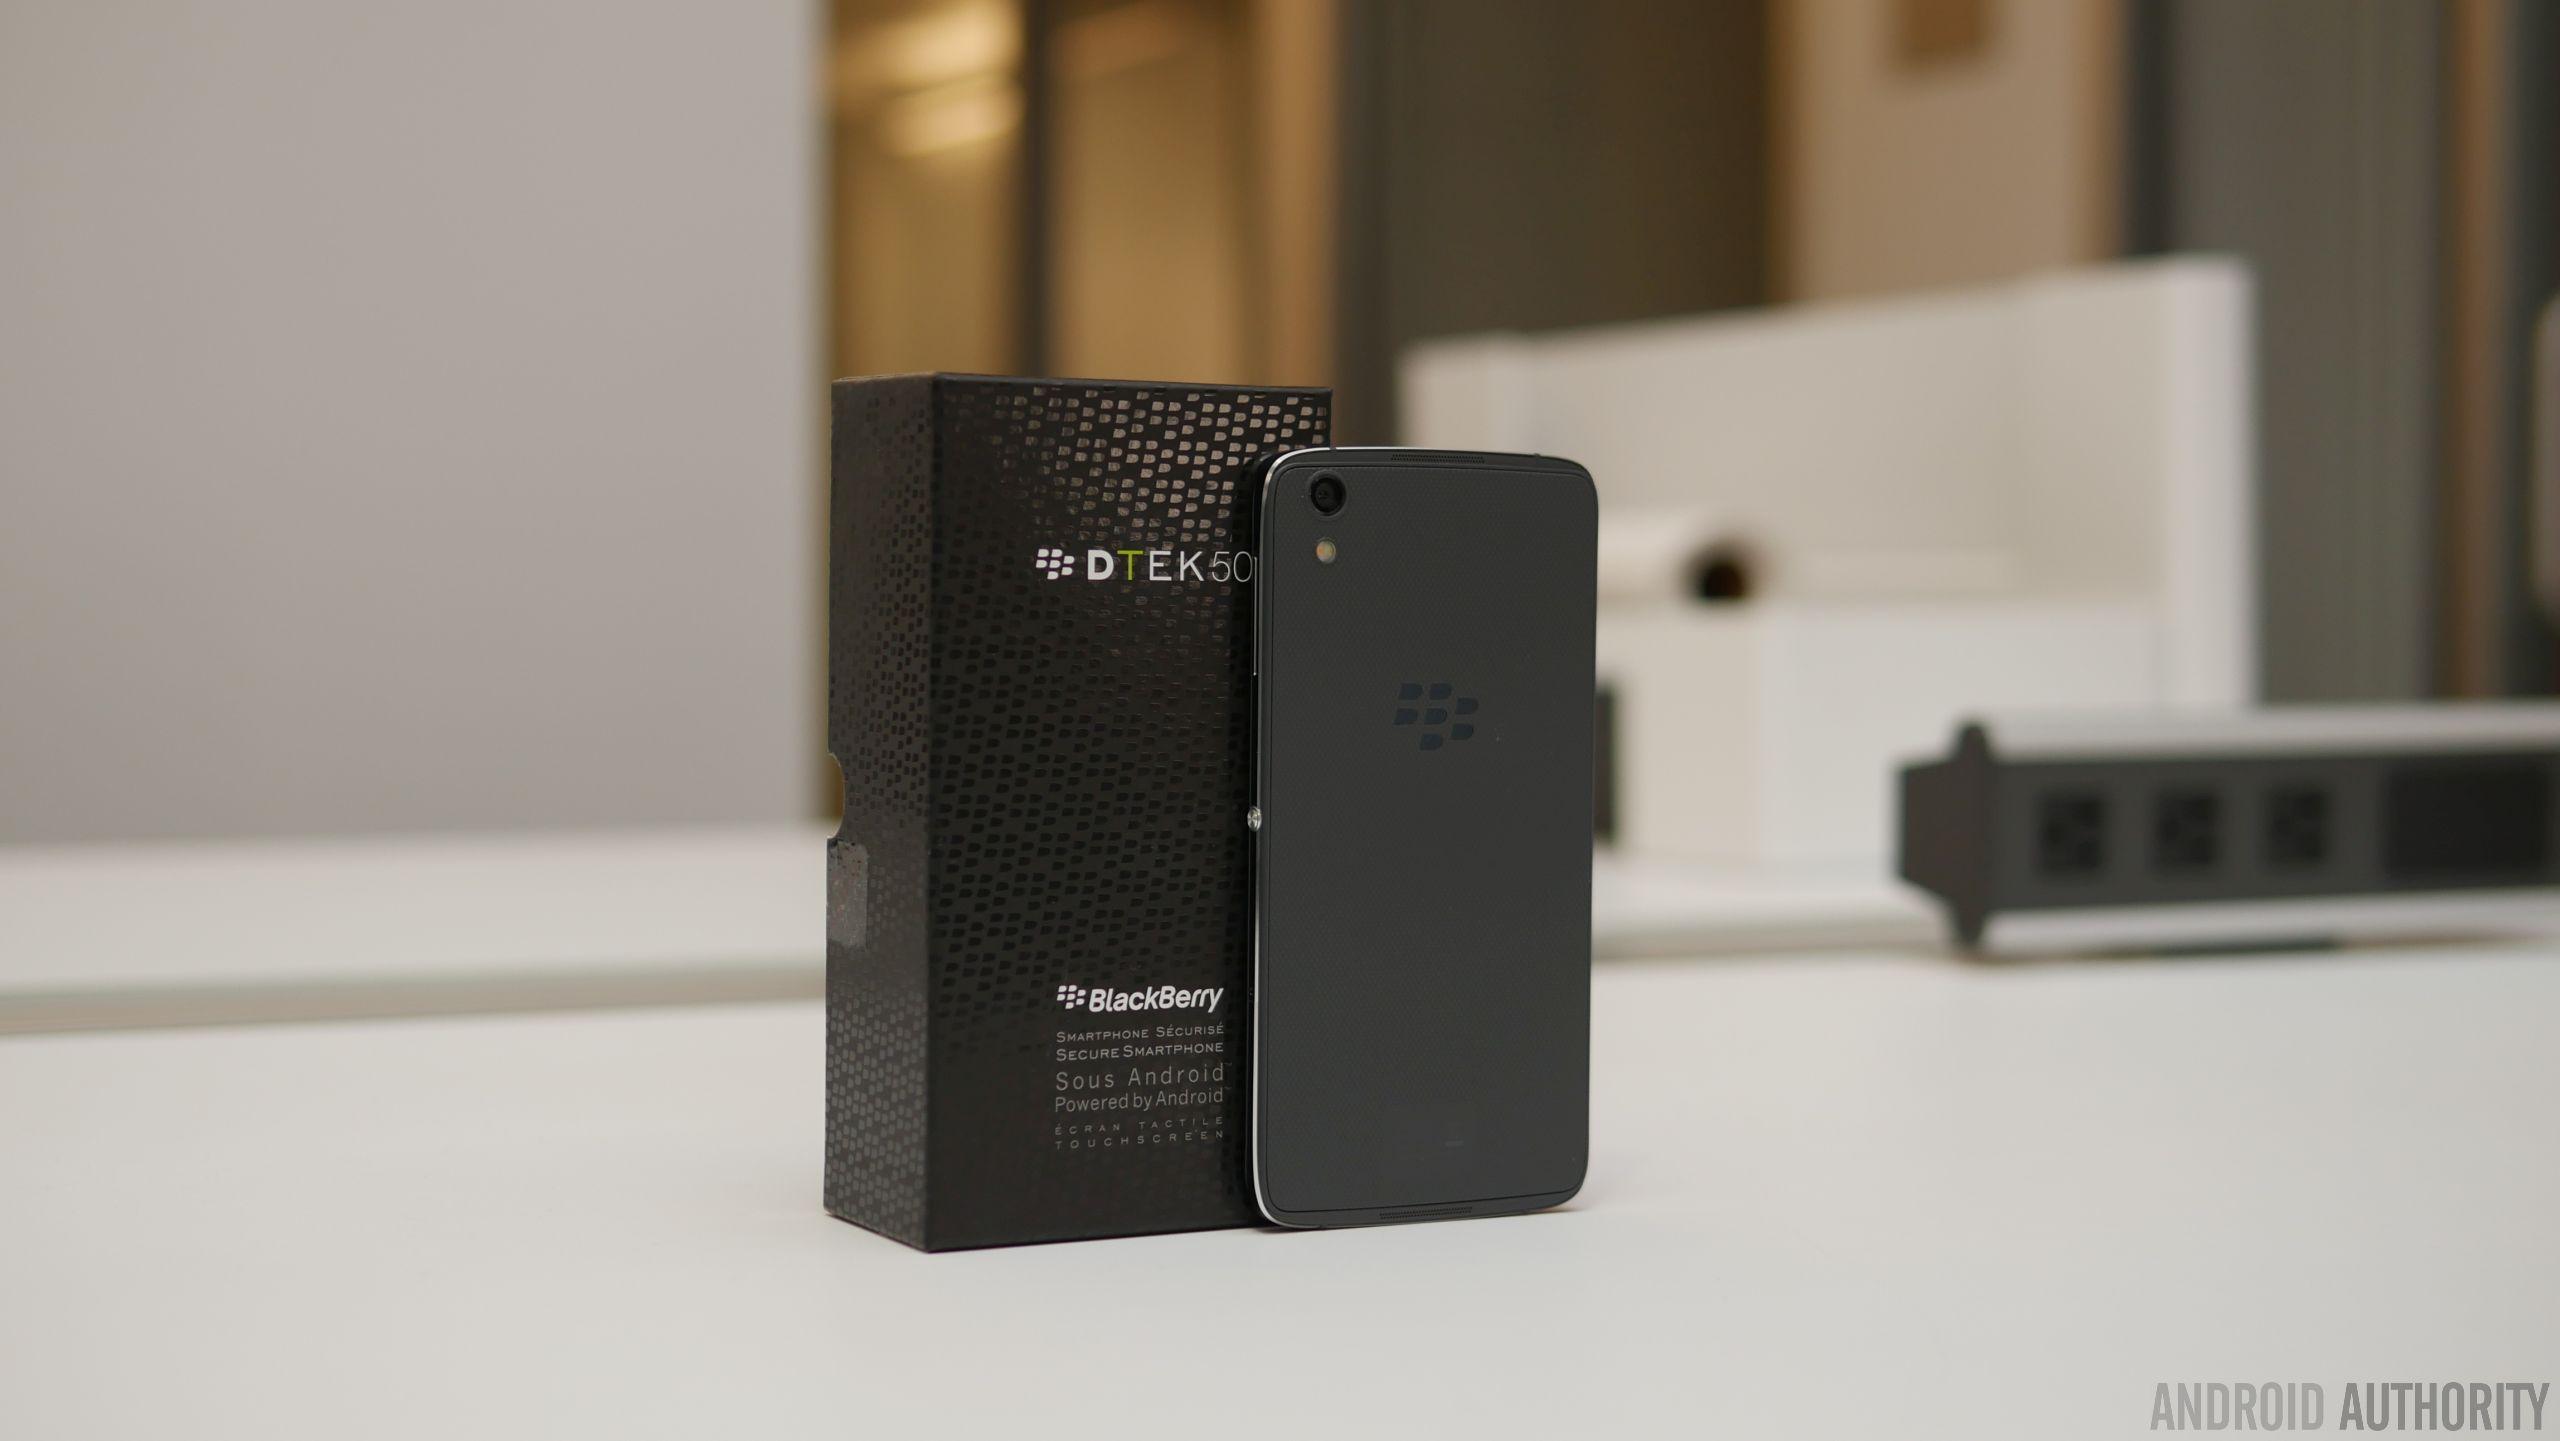 BlackBerry-DTEK50-hands-on-3